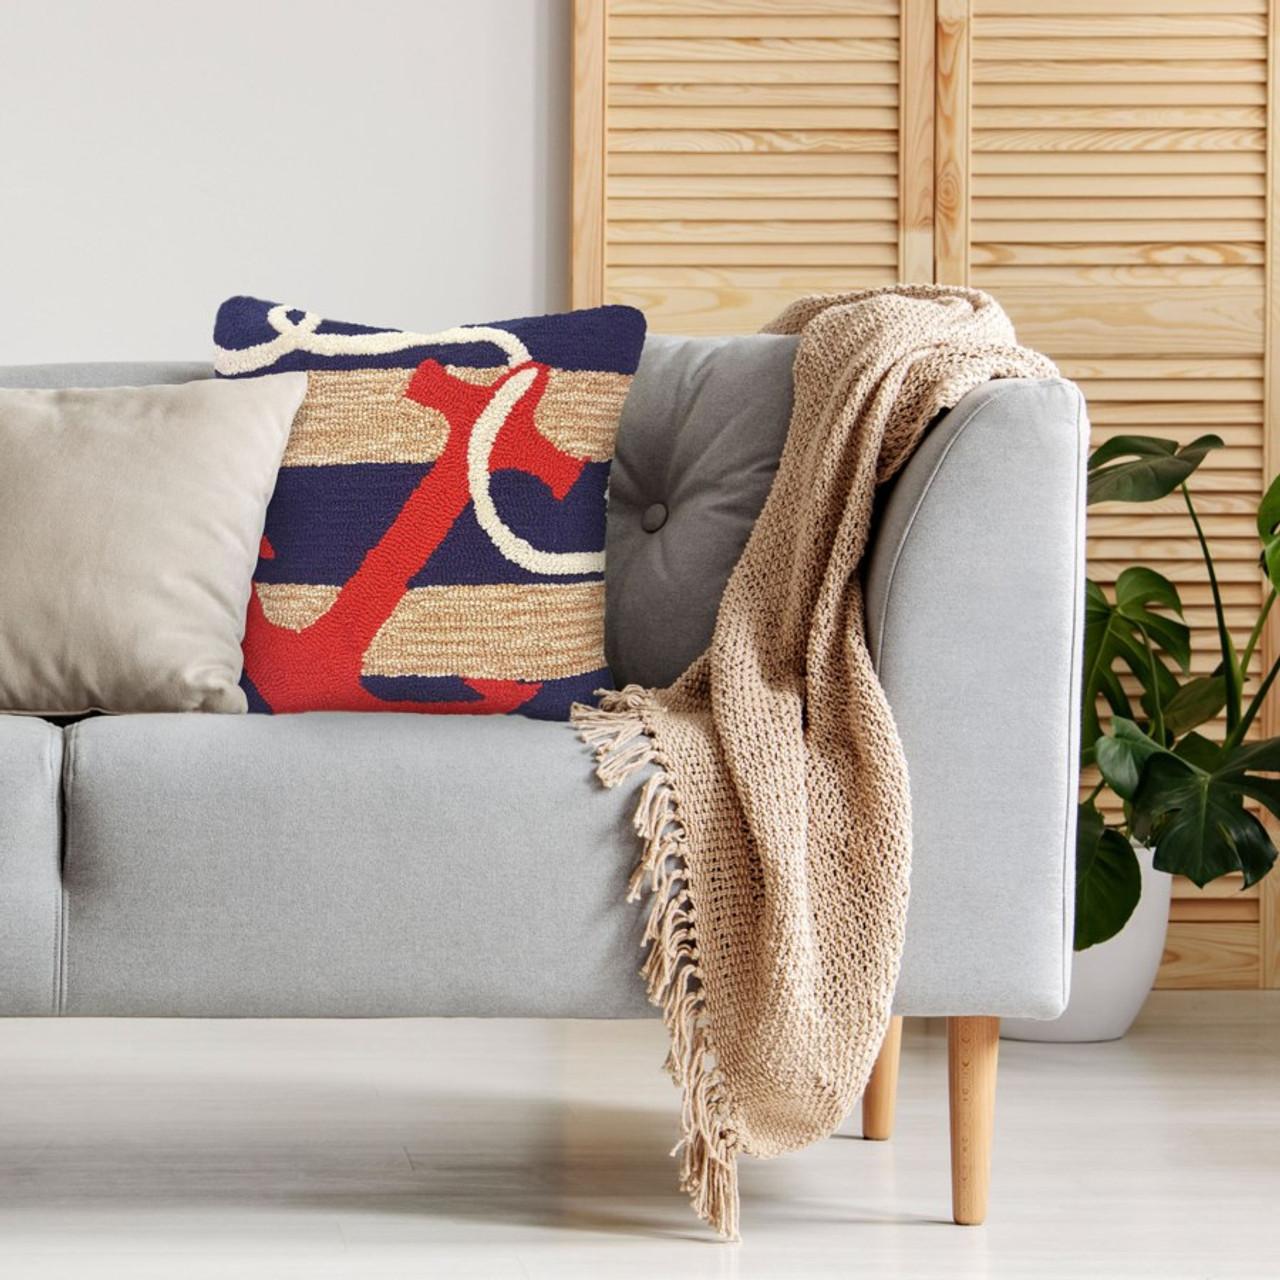 Frontporch Navy Anchor Indoor/Outdoor Throw Pillow - Lifestyle 1